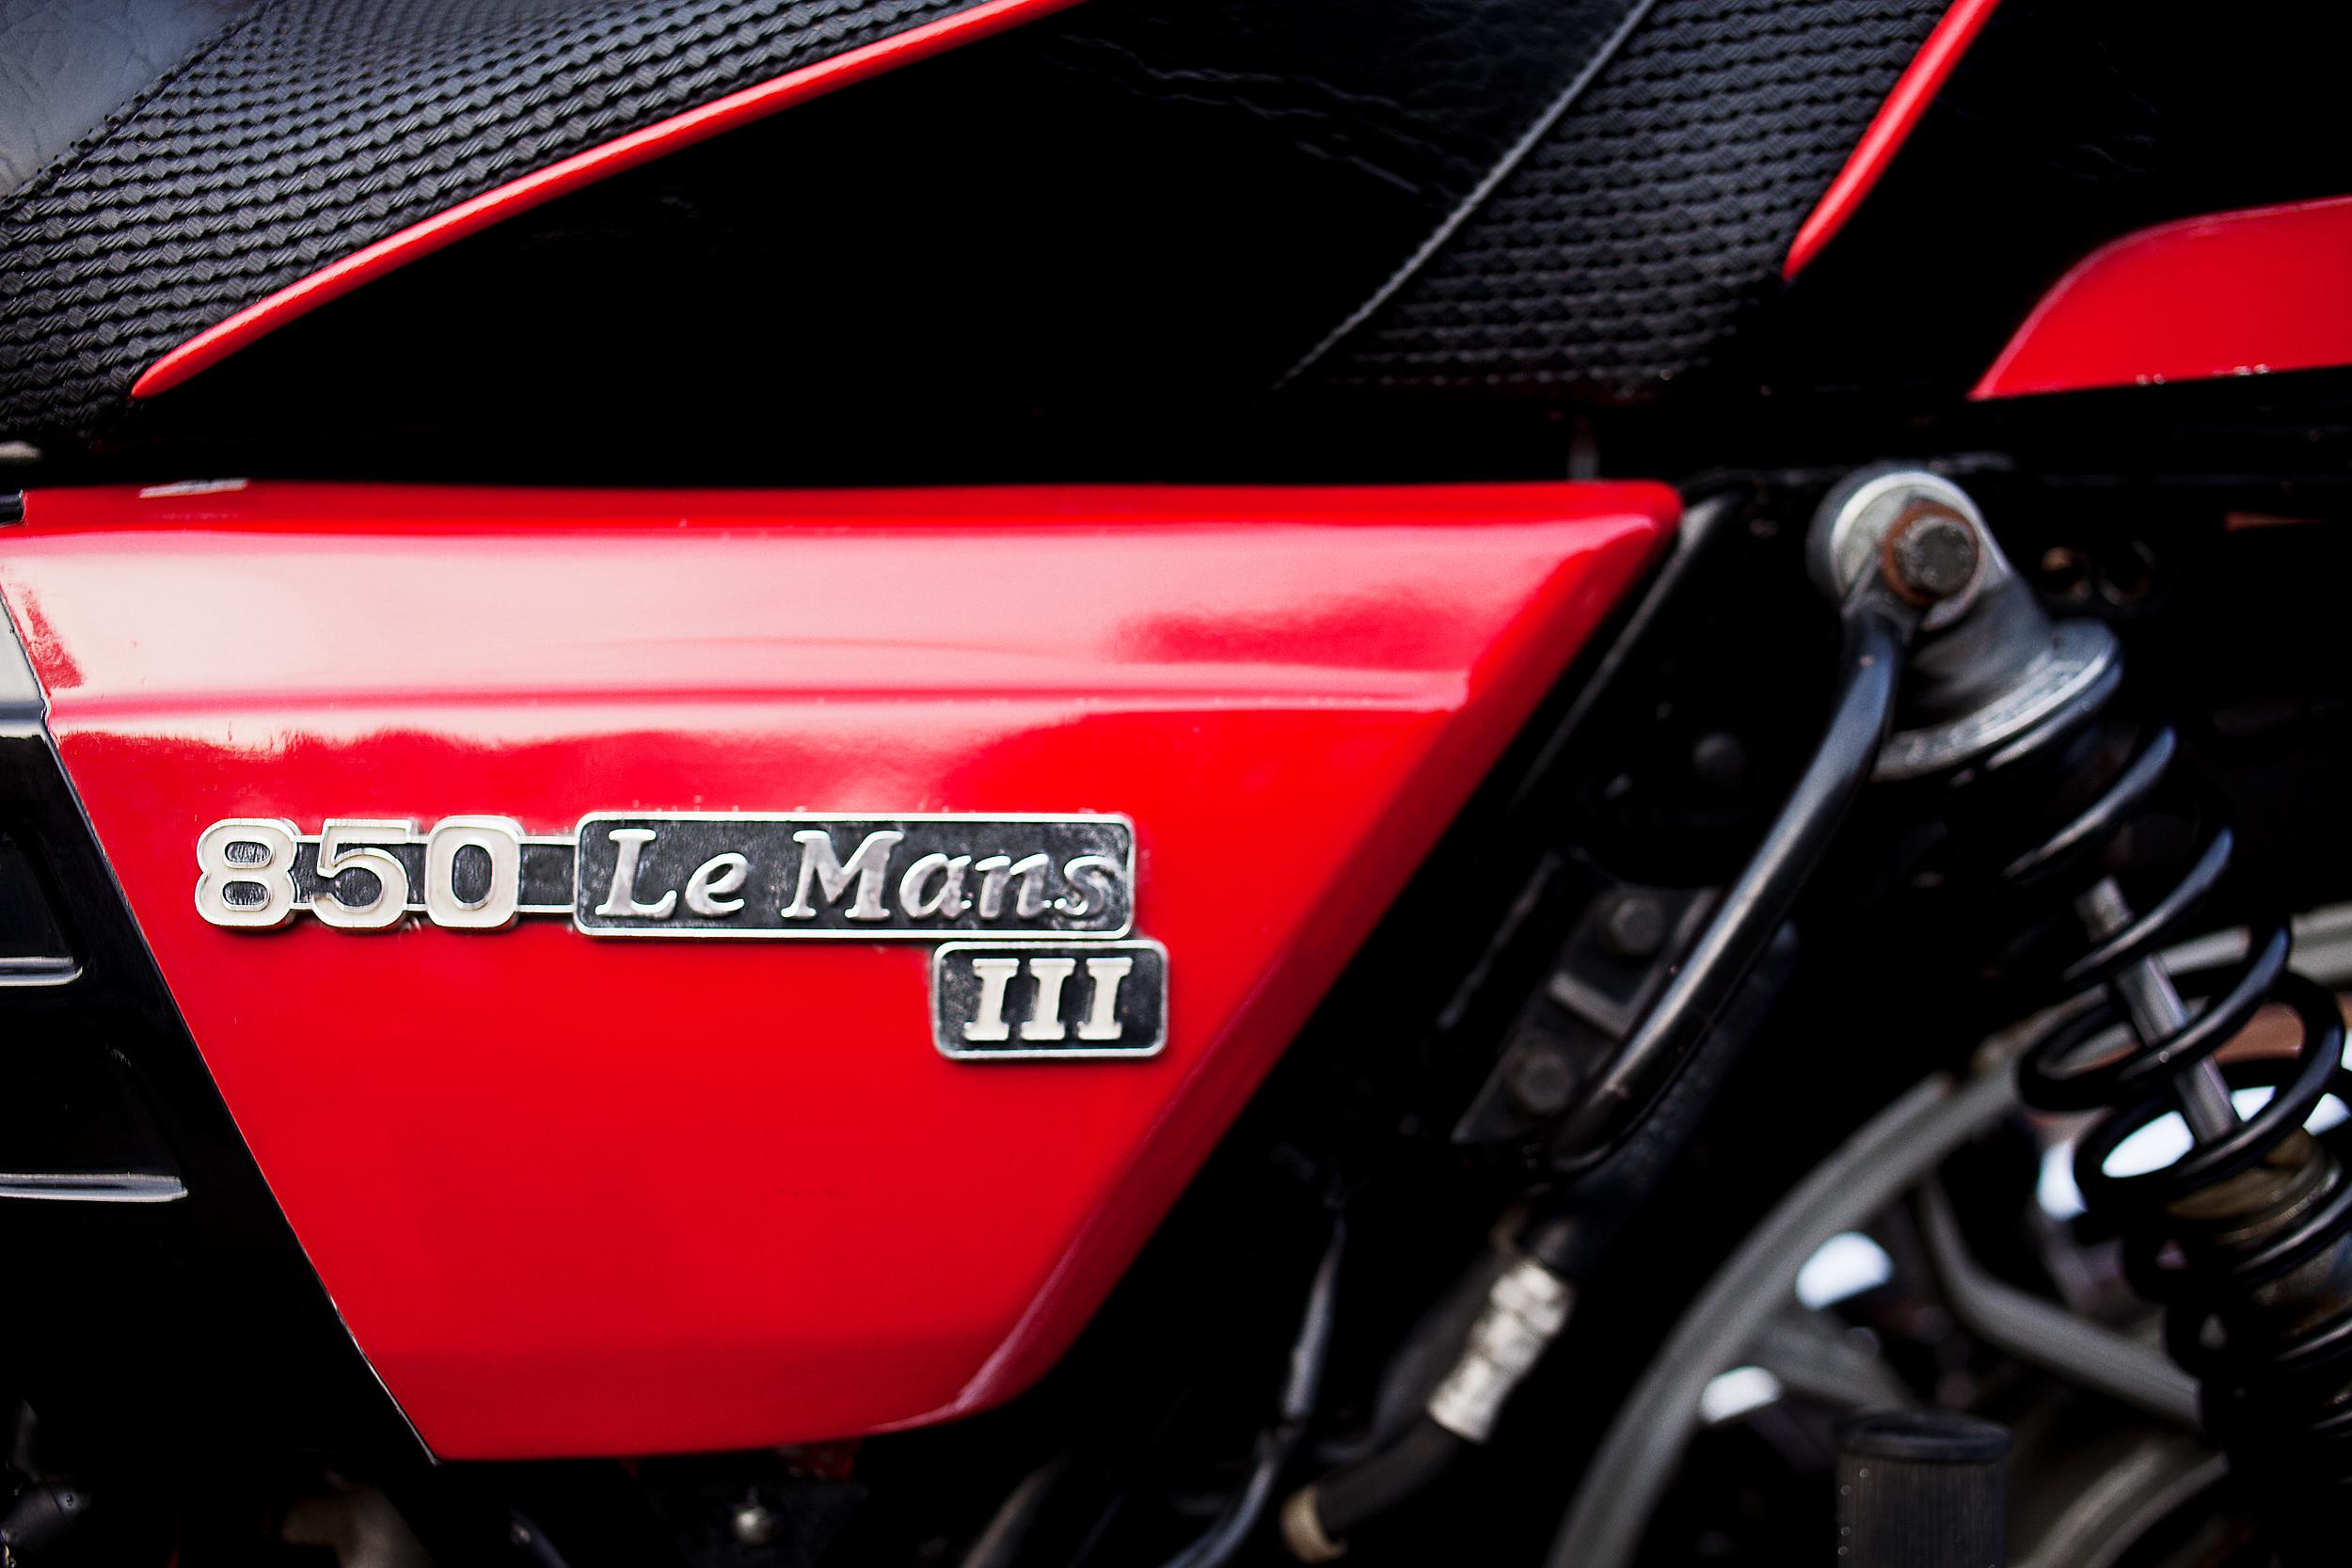 Moto Guzzi Lemans 3 Side Cover